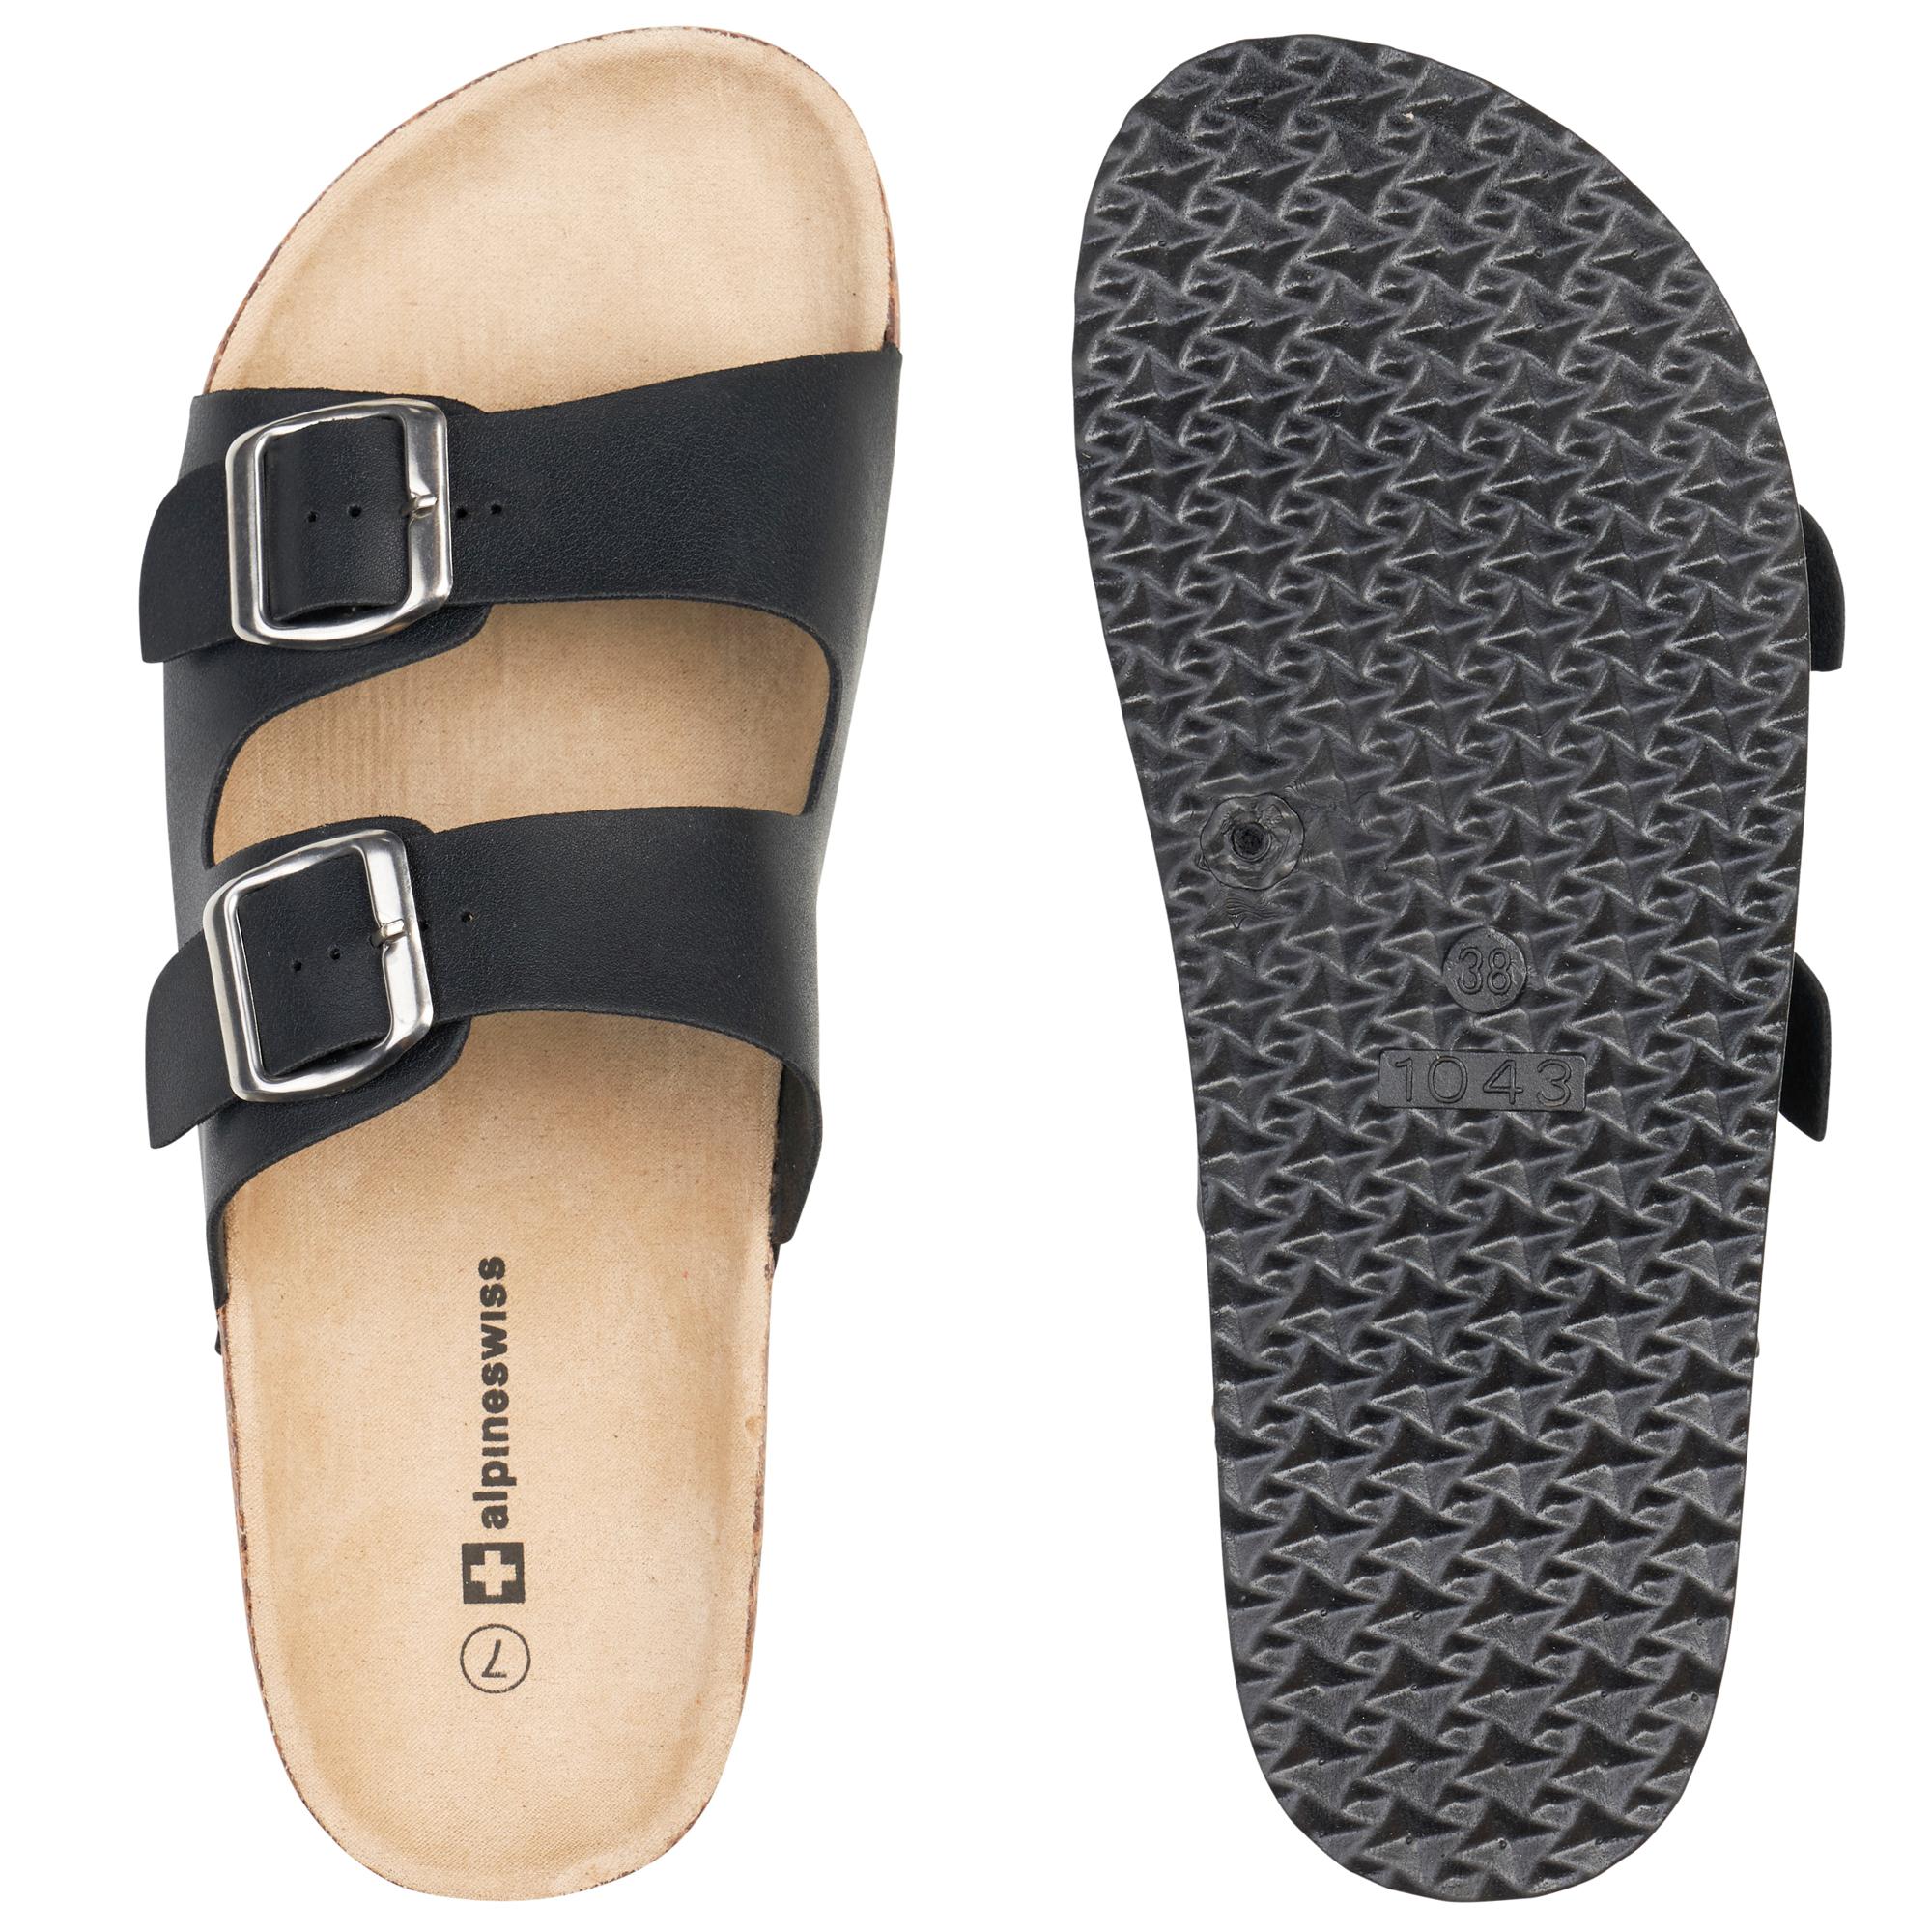 0cd986b381083f Alpine Swiss Womens Double Strap Slide Sandals EVA Sole Flat Comfort ...